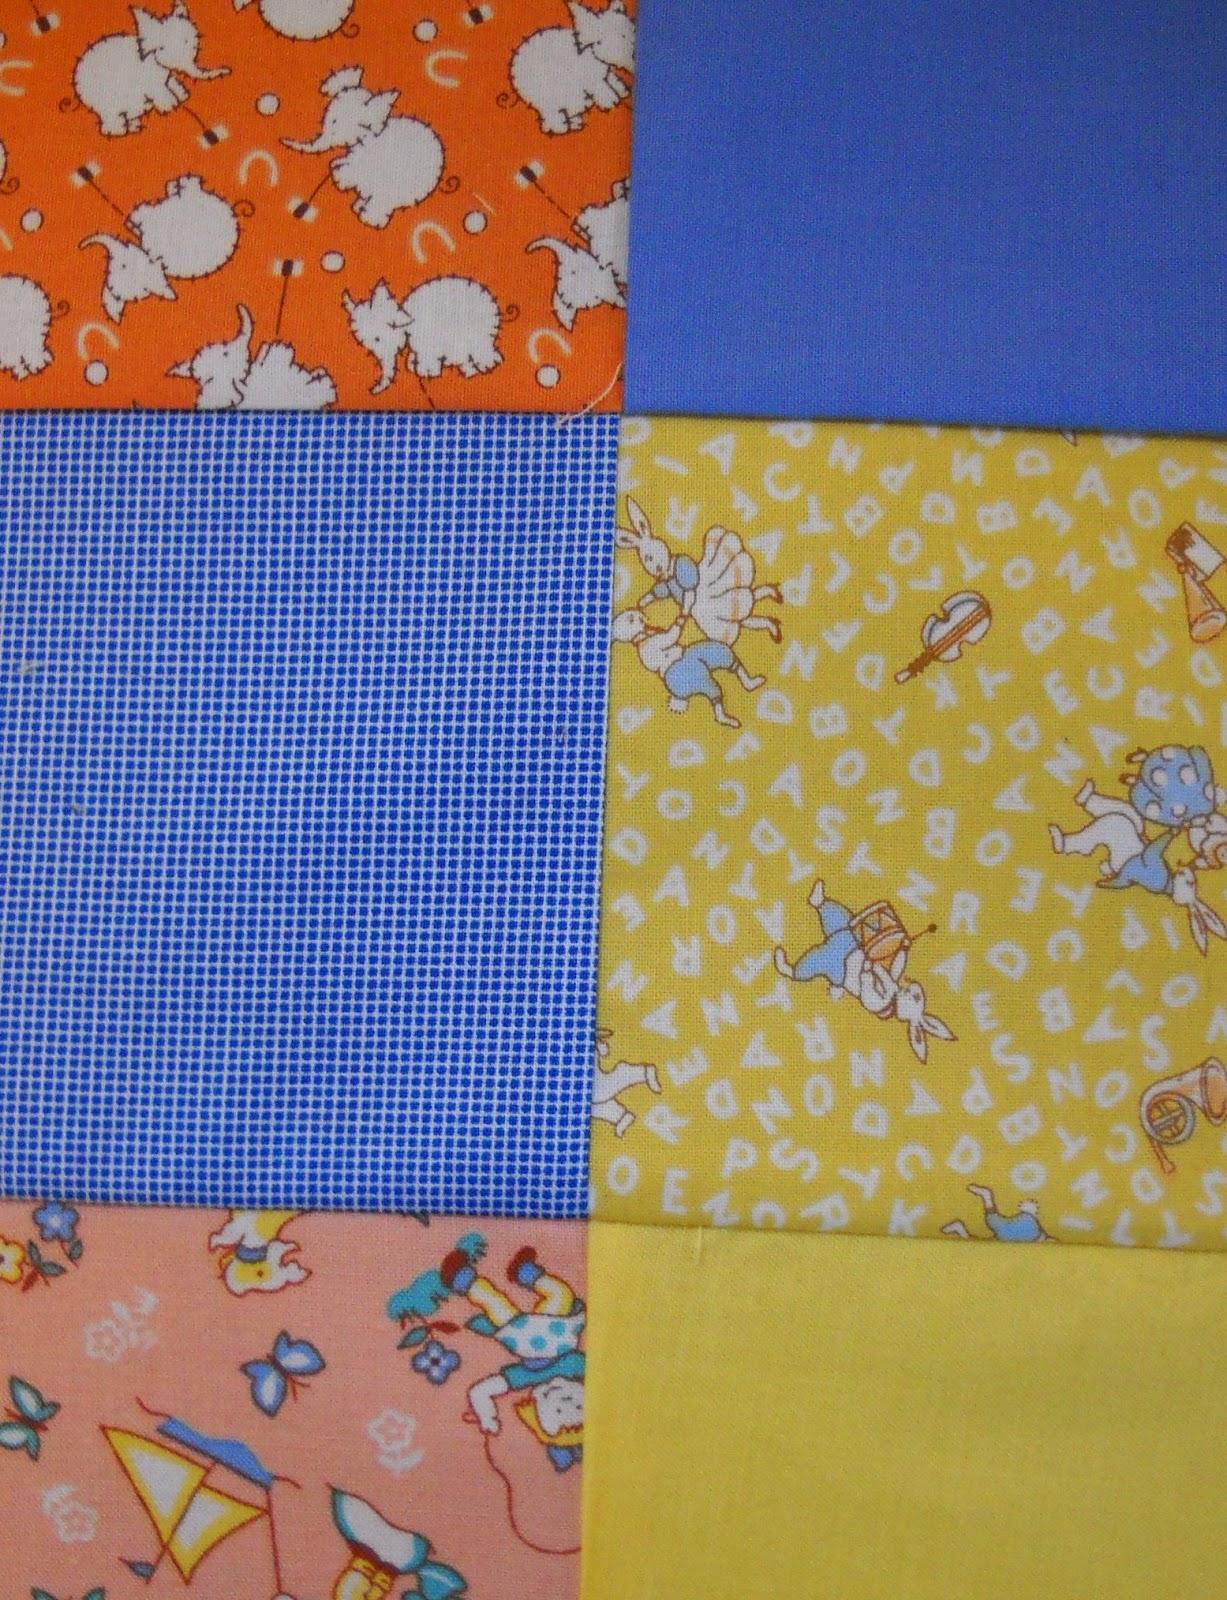 Quilt Patterns With Y Seams : Val s Quilting Studio: Nesting Seams Tutorial